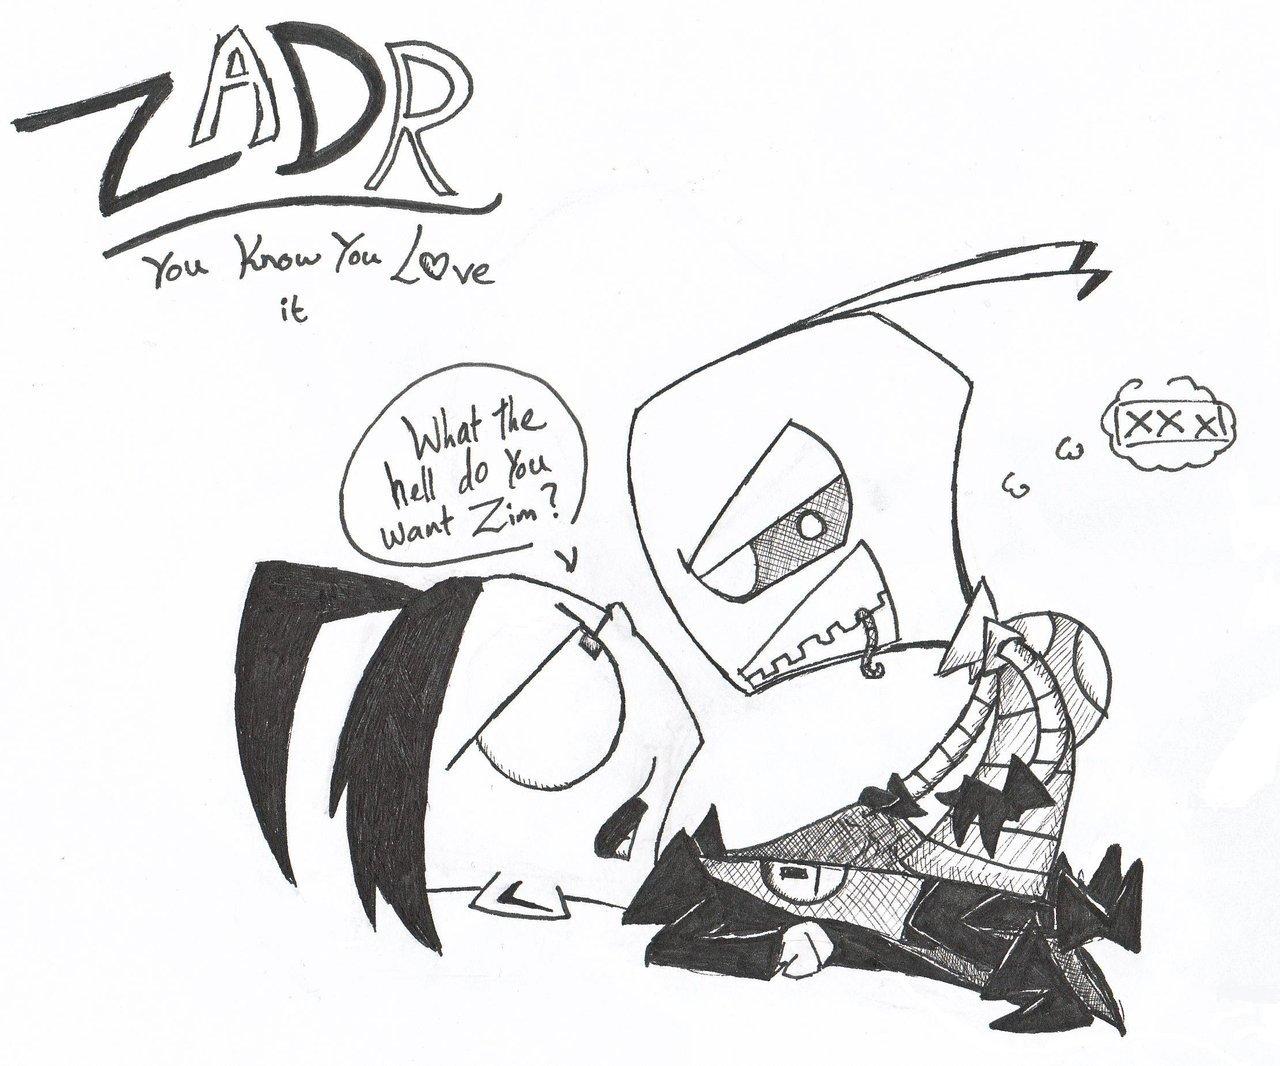 1280x1066 Random Zadr By Invader Zim Fever